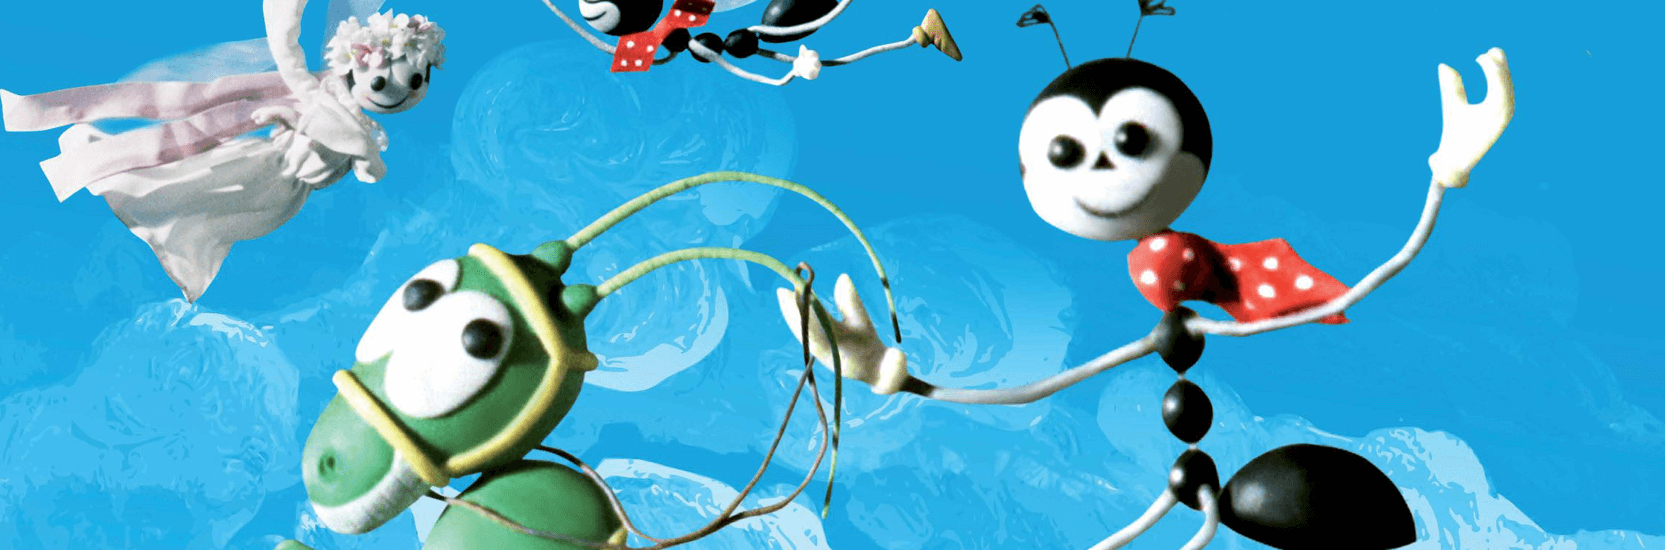 Critique – Les nouvelles aventures de Ferda la fourmi